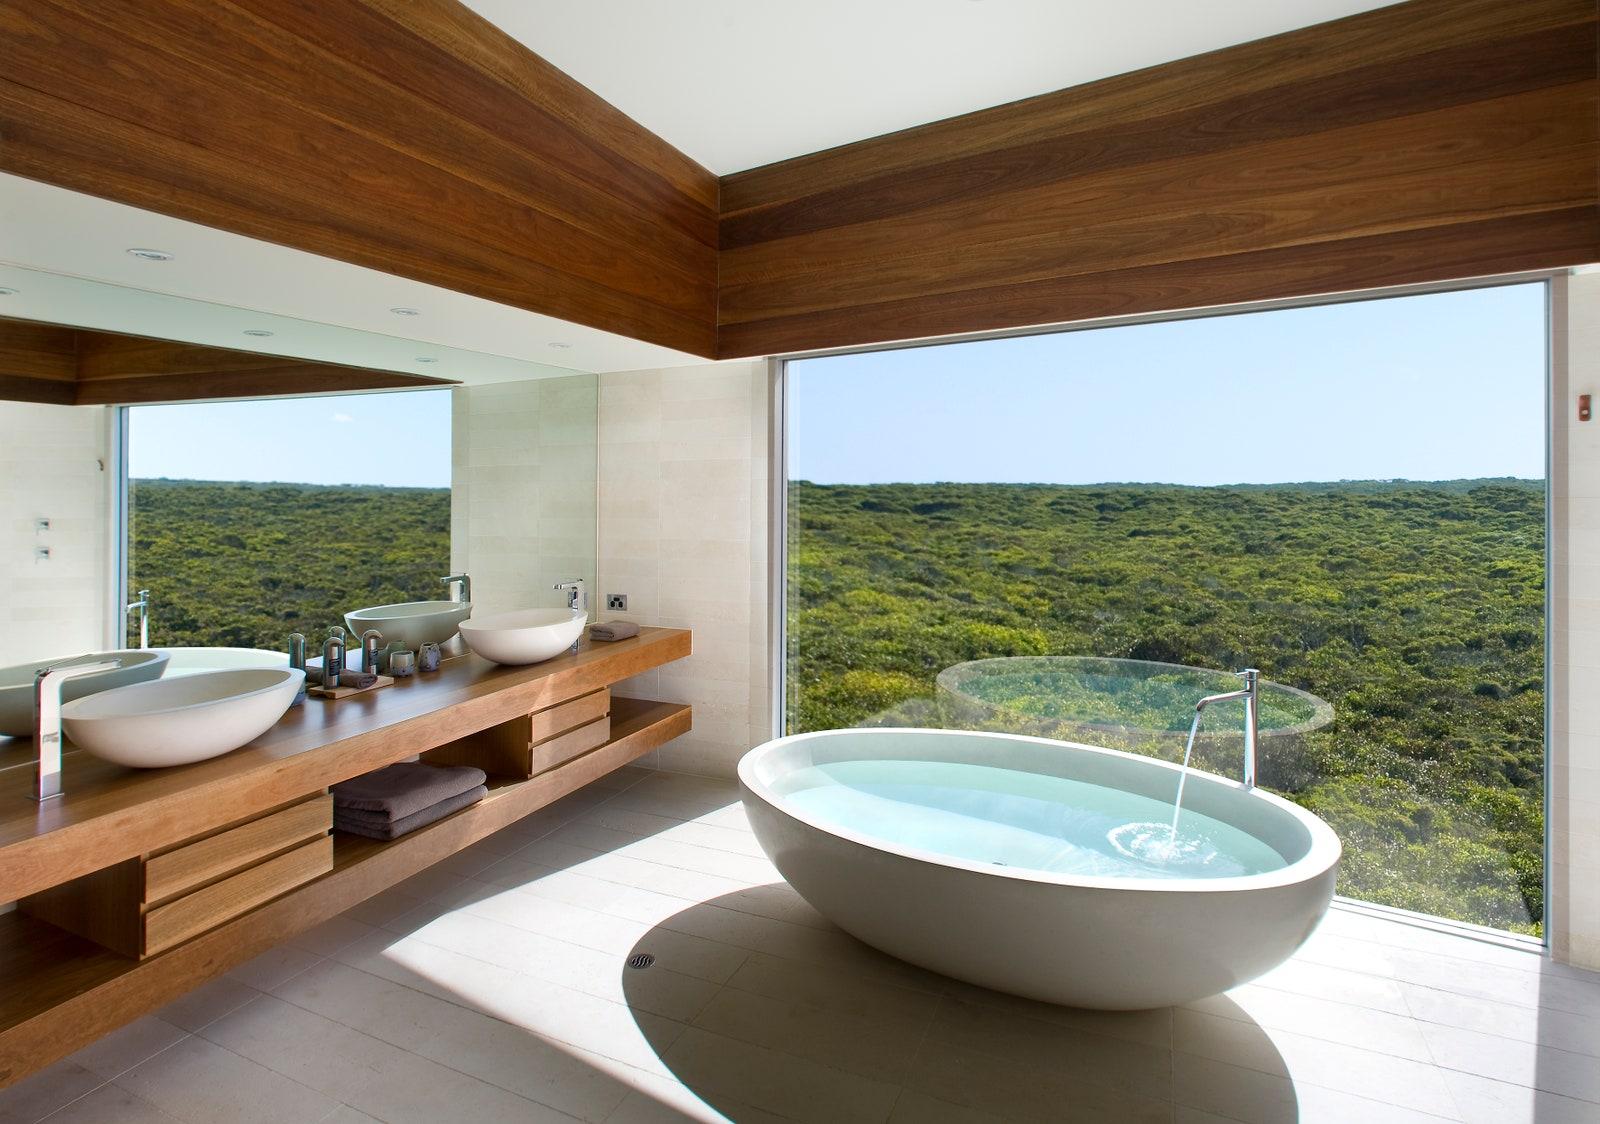 Desain kamar mandi di Southern Ocean Lodge, Australia - source: architecturaldigest.com